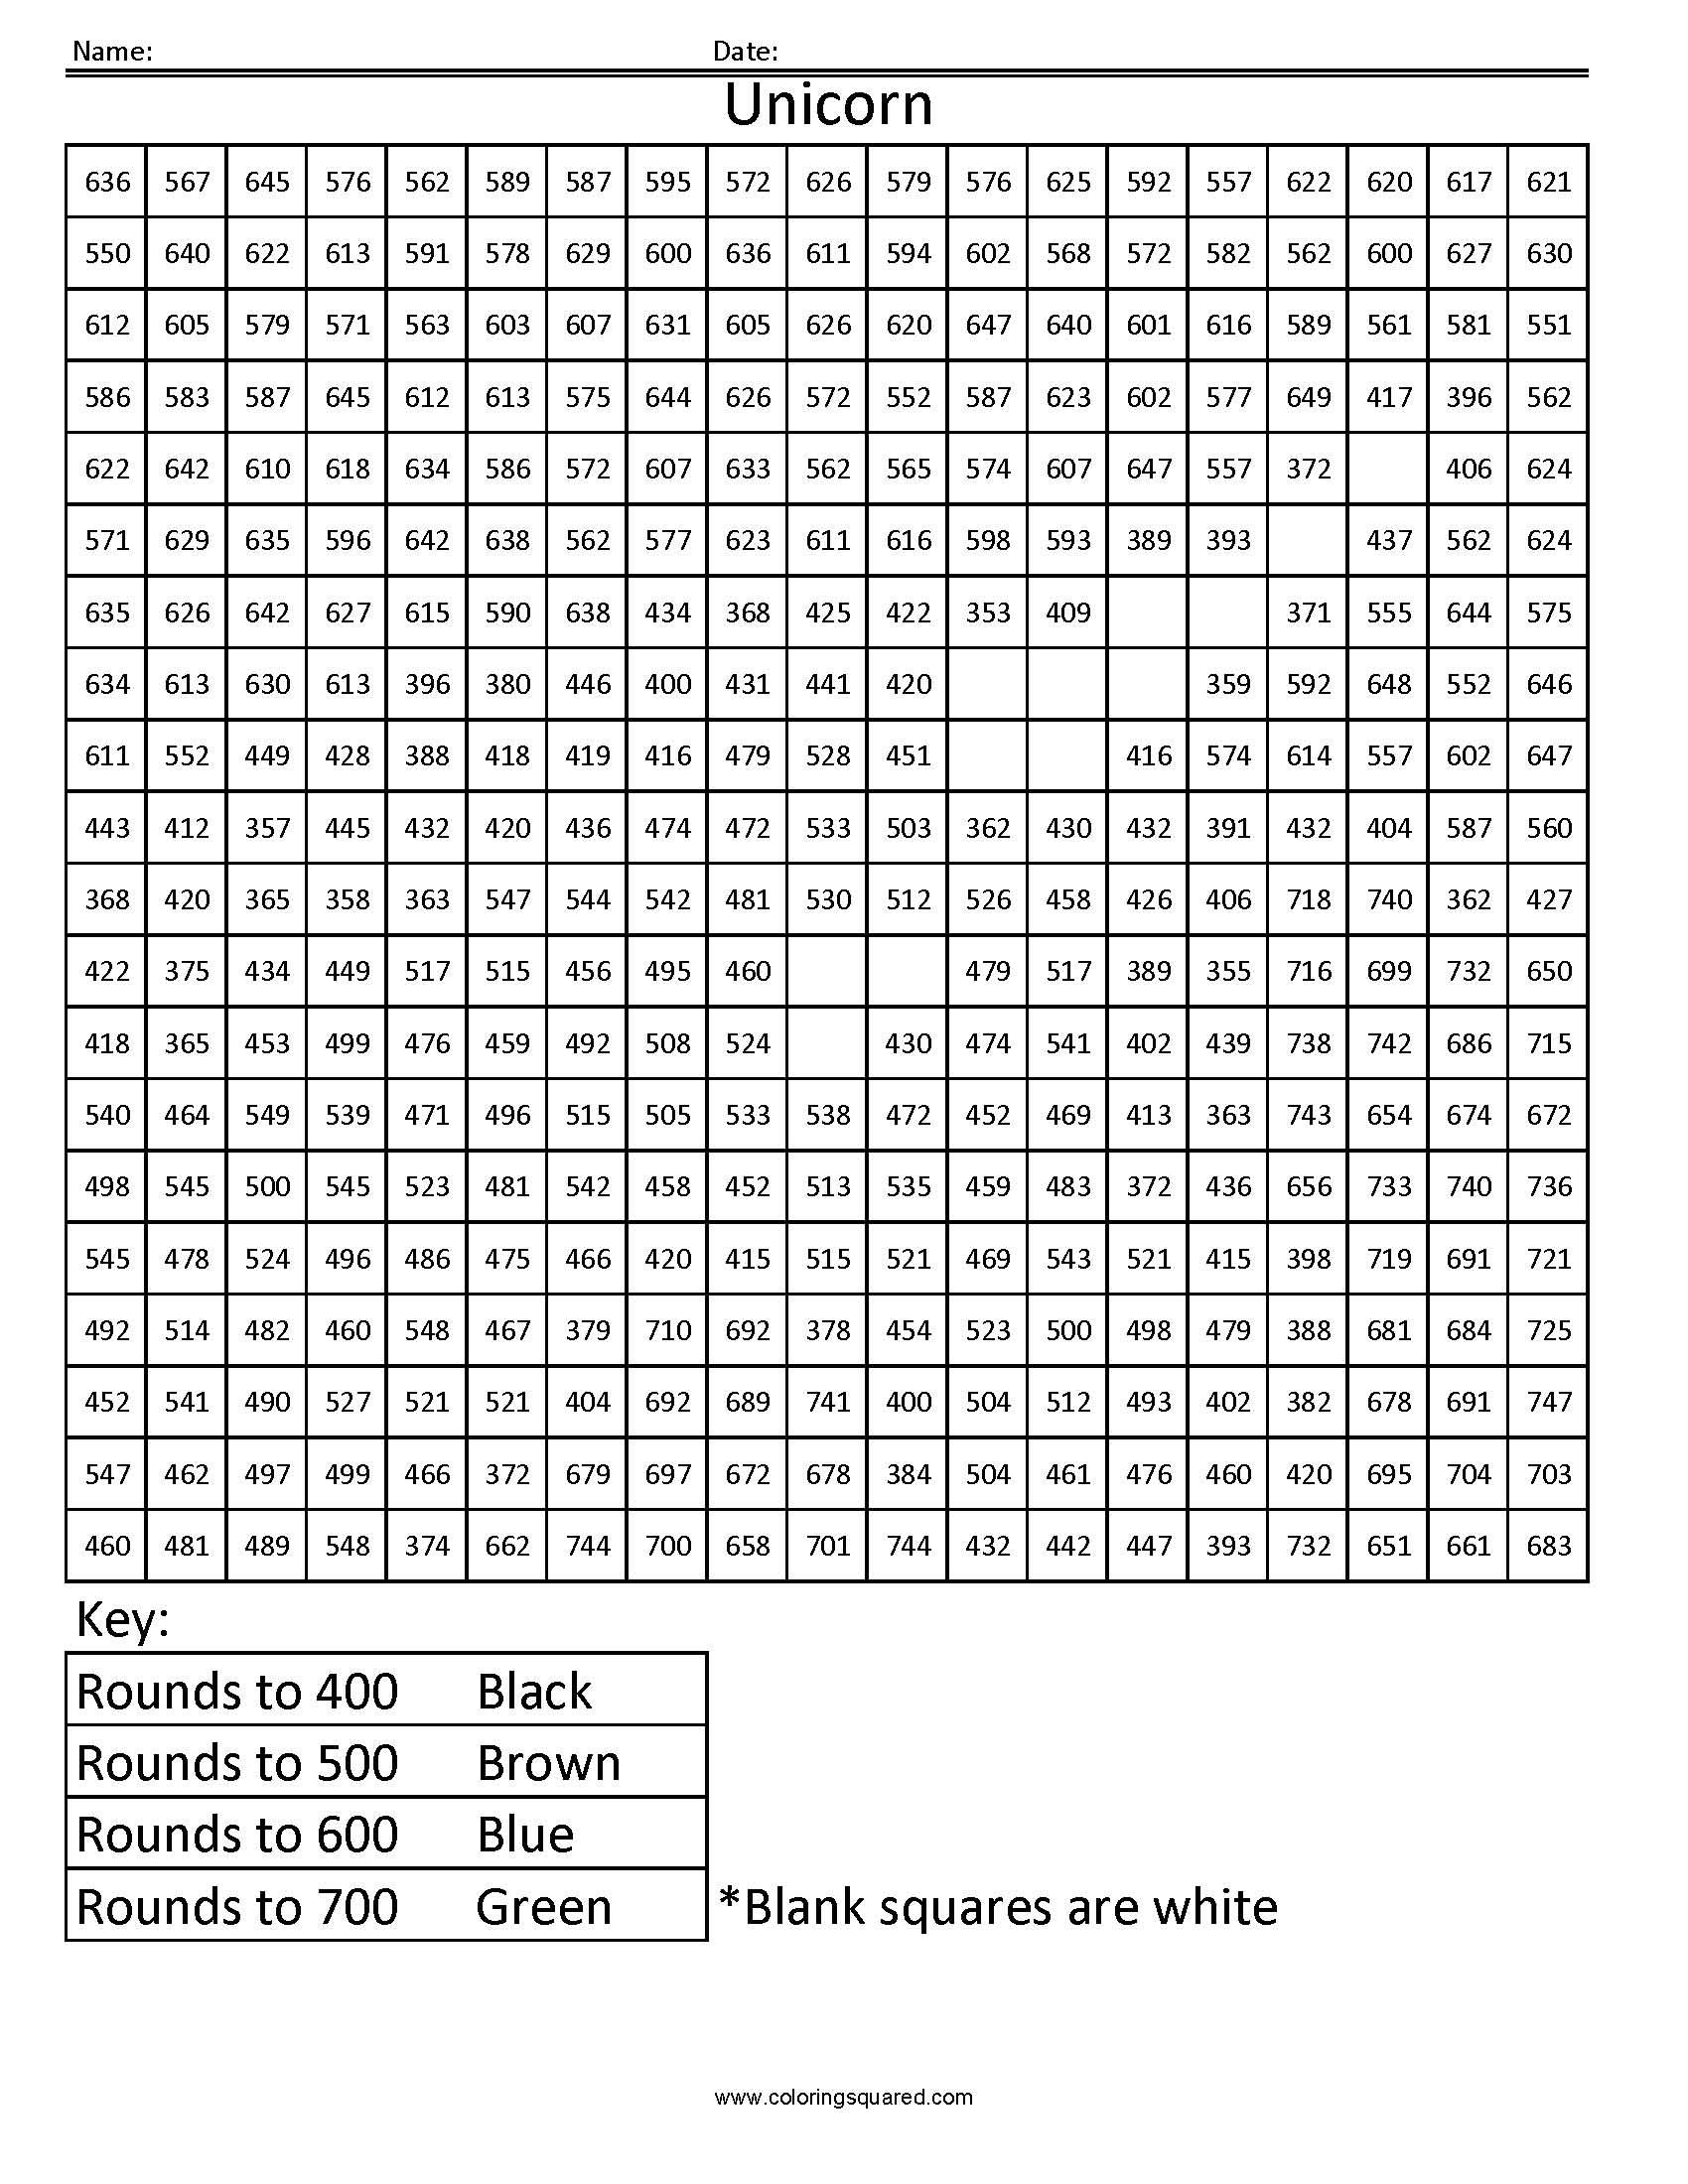 Rh4 Unicorn Free Rounding Math Worksheets For Kids